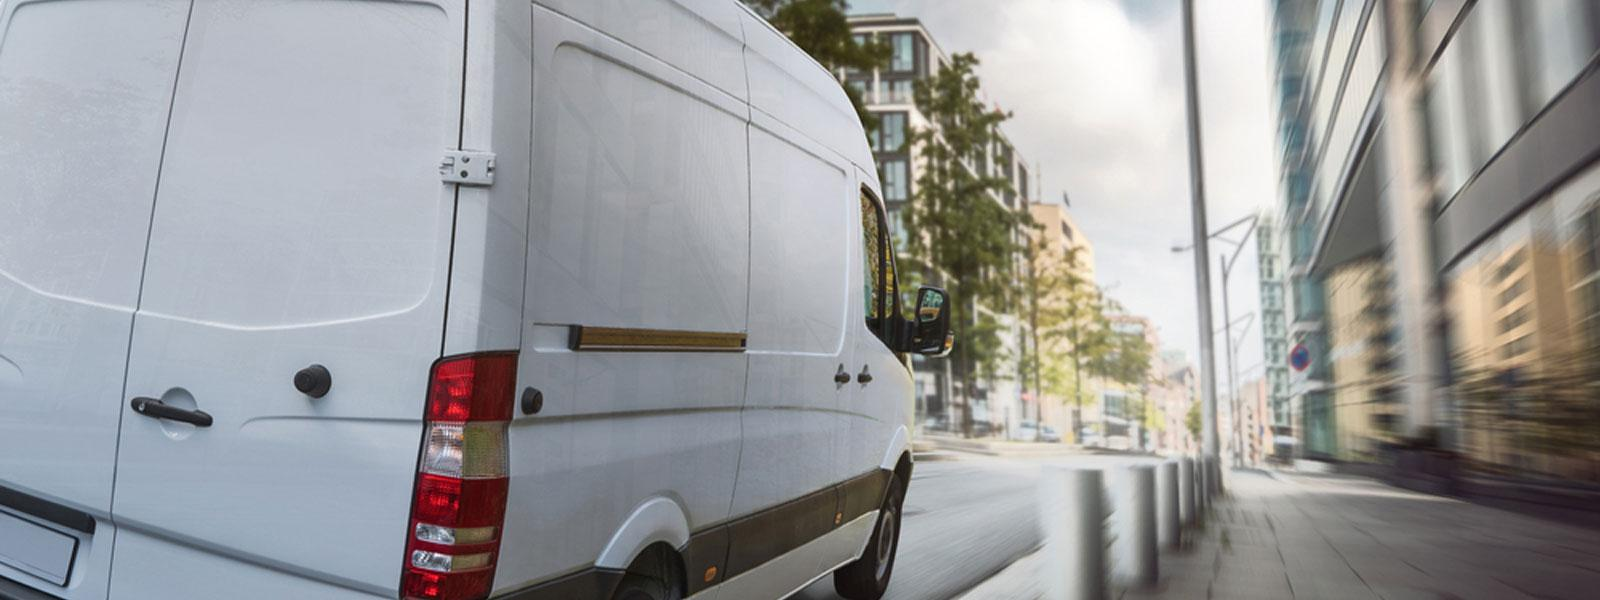 White van driving through a city